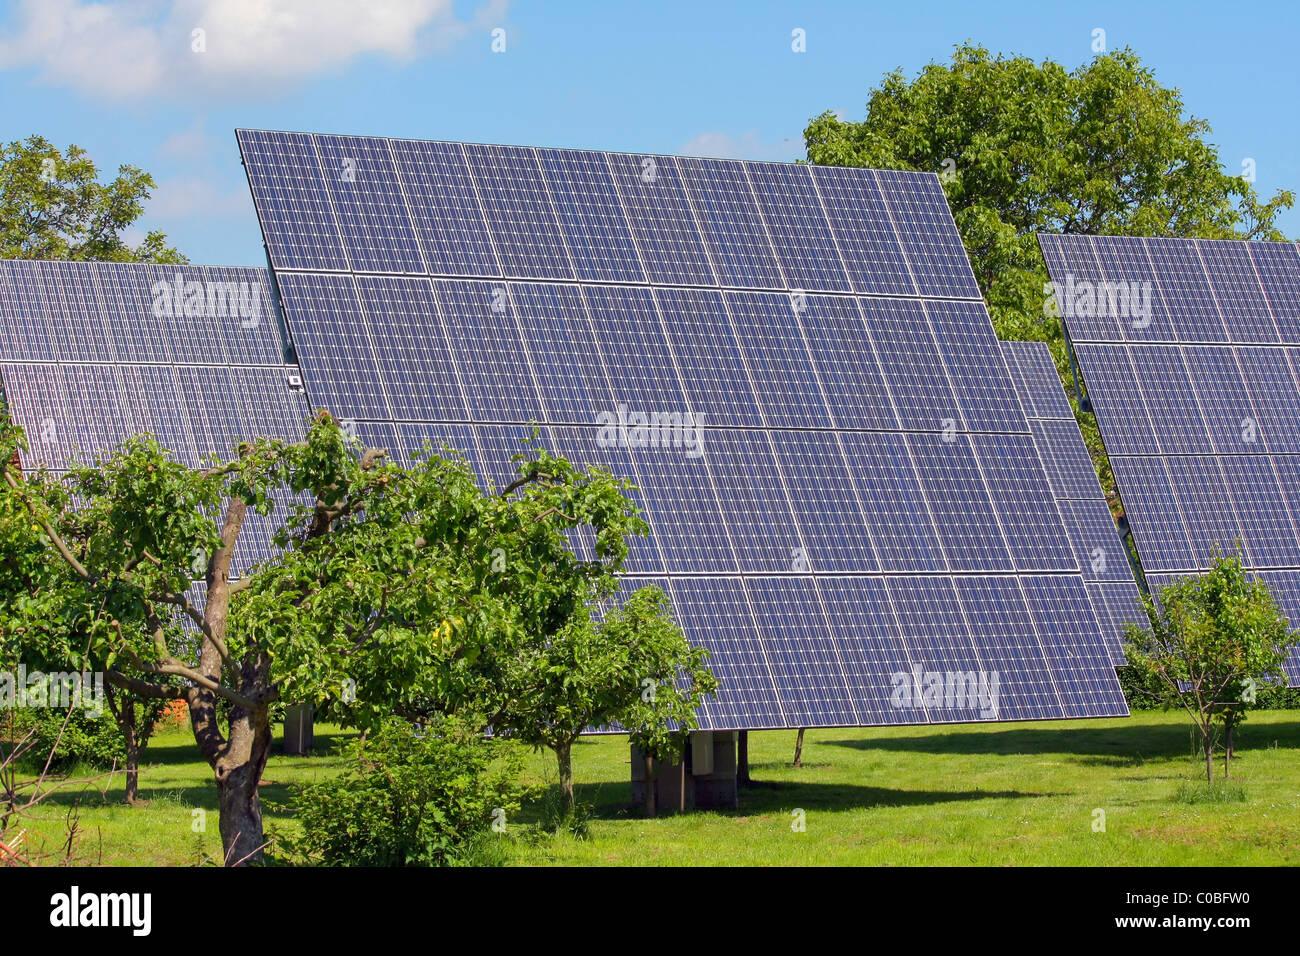 solar power plant - Stock Image